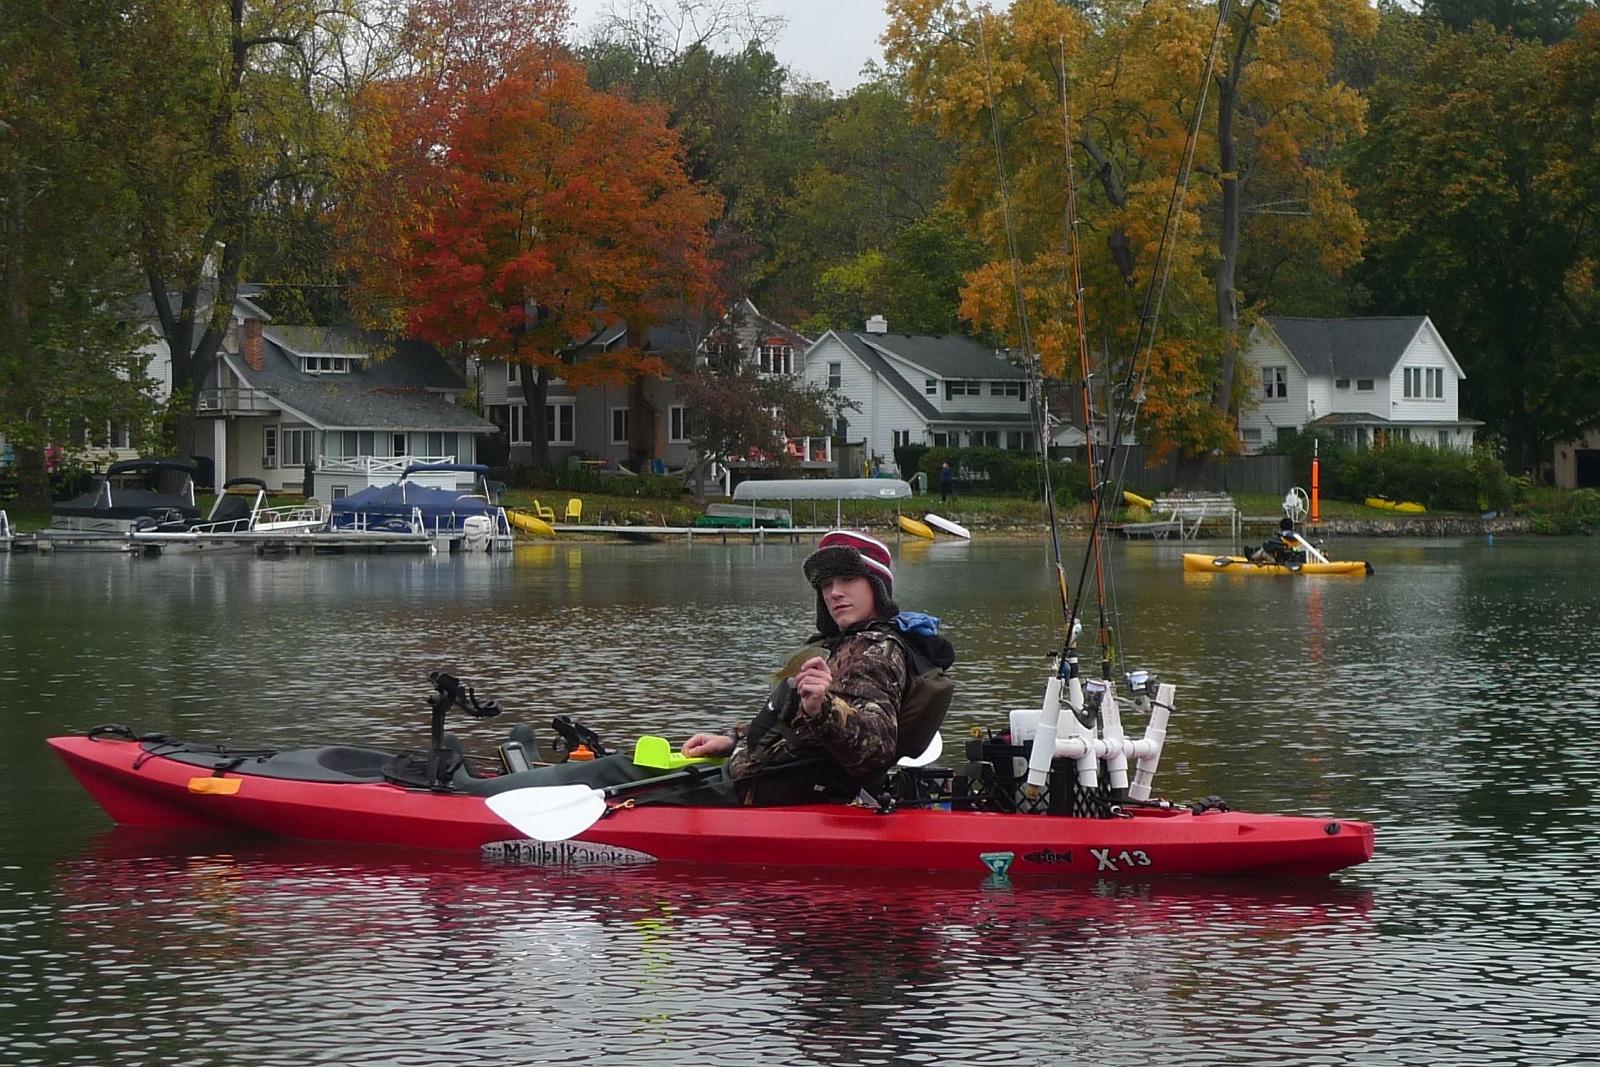 The kayak kid cashes in on michigan fall fishing outdoorhub for Kayak fishing tournaments near me